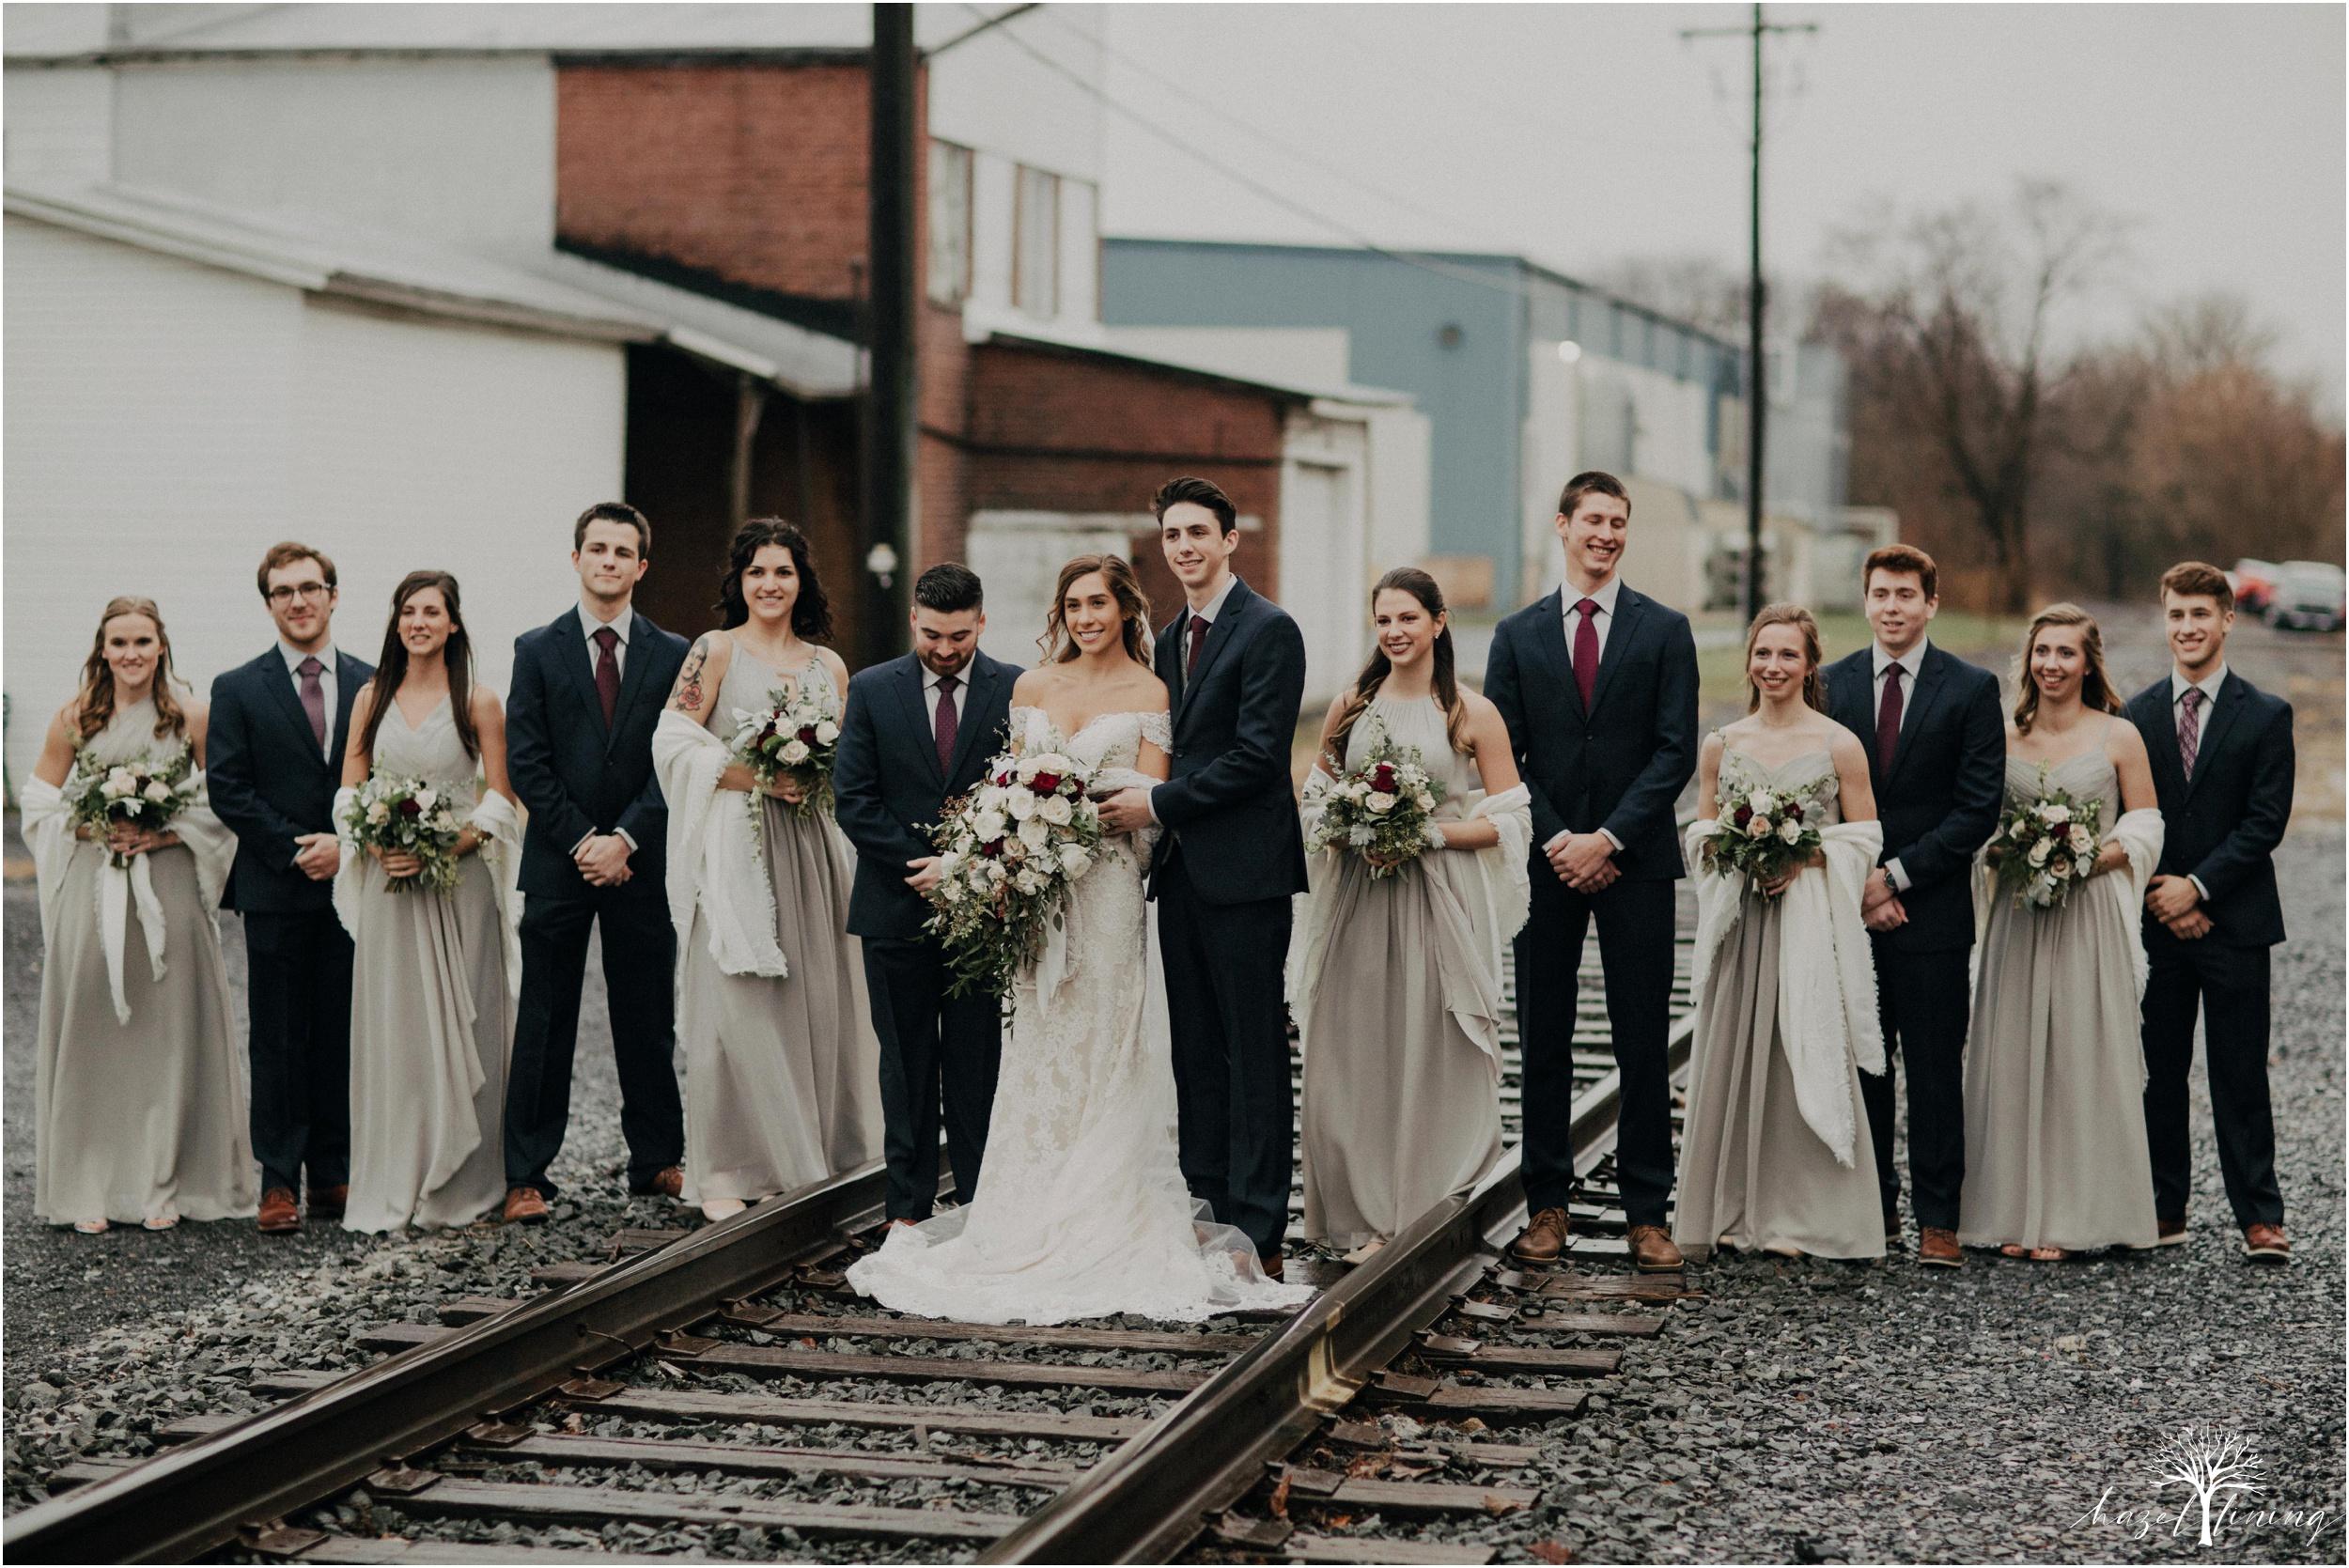 emma-matt-gehringer-the-booking-house-lancaster-manhiem-pennsylvania-winter-wedding_0073.jpg